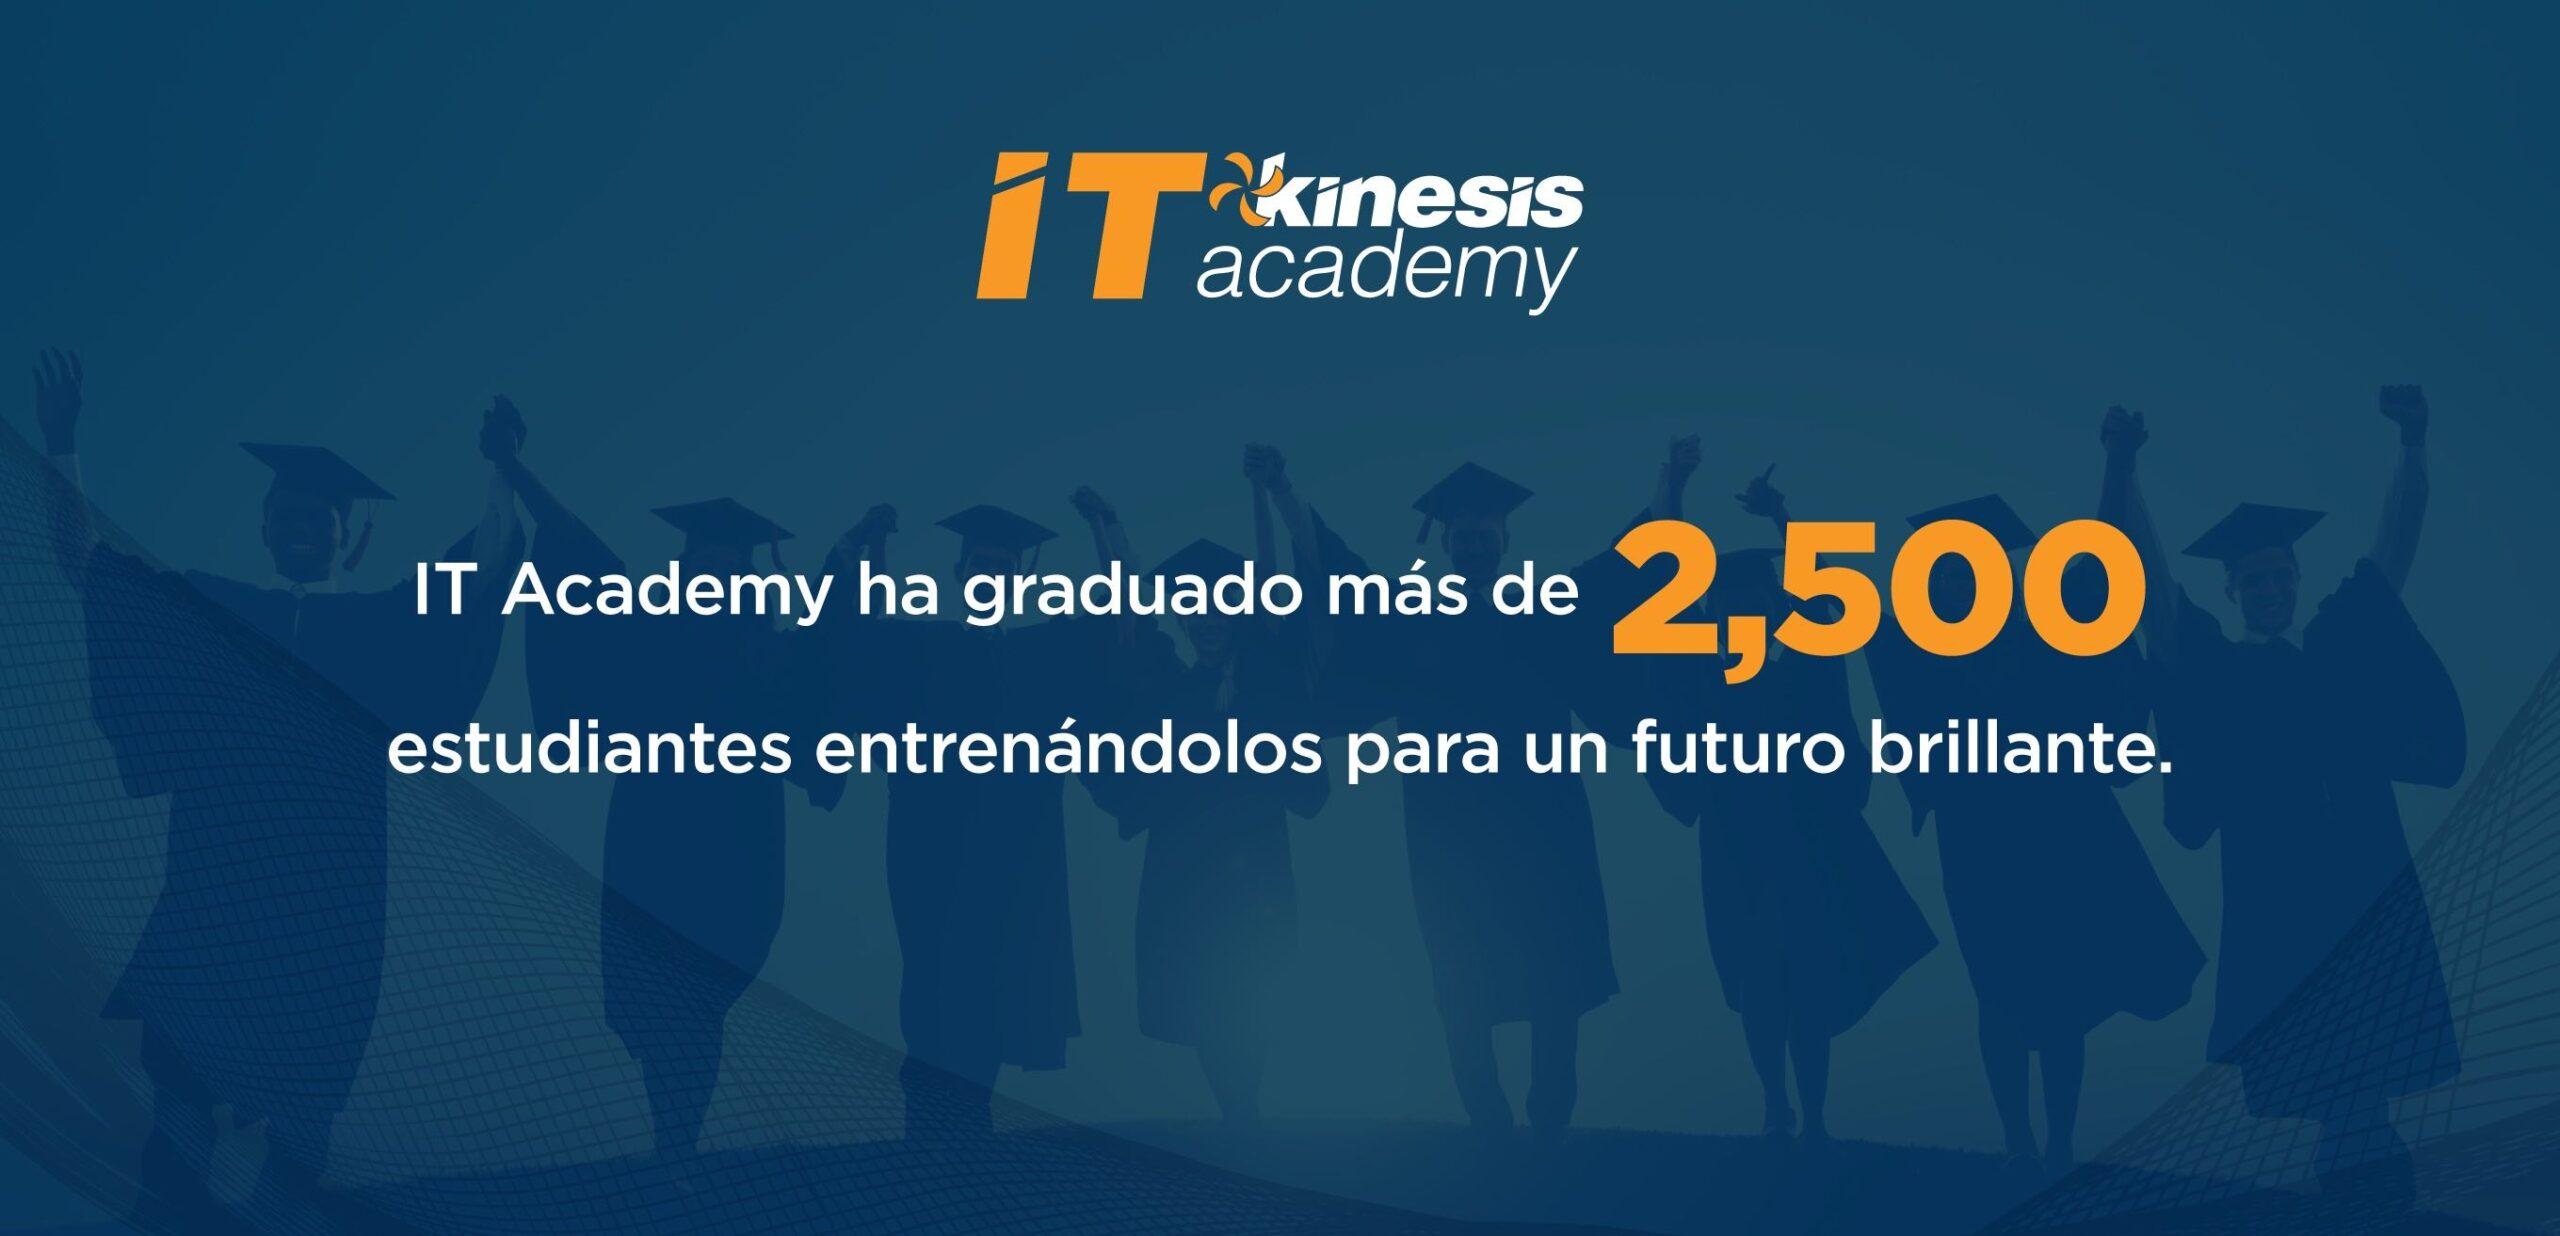 Graduados Kinesis IT Academy